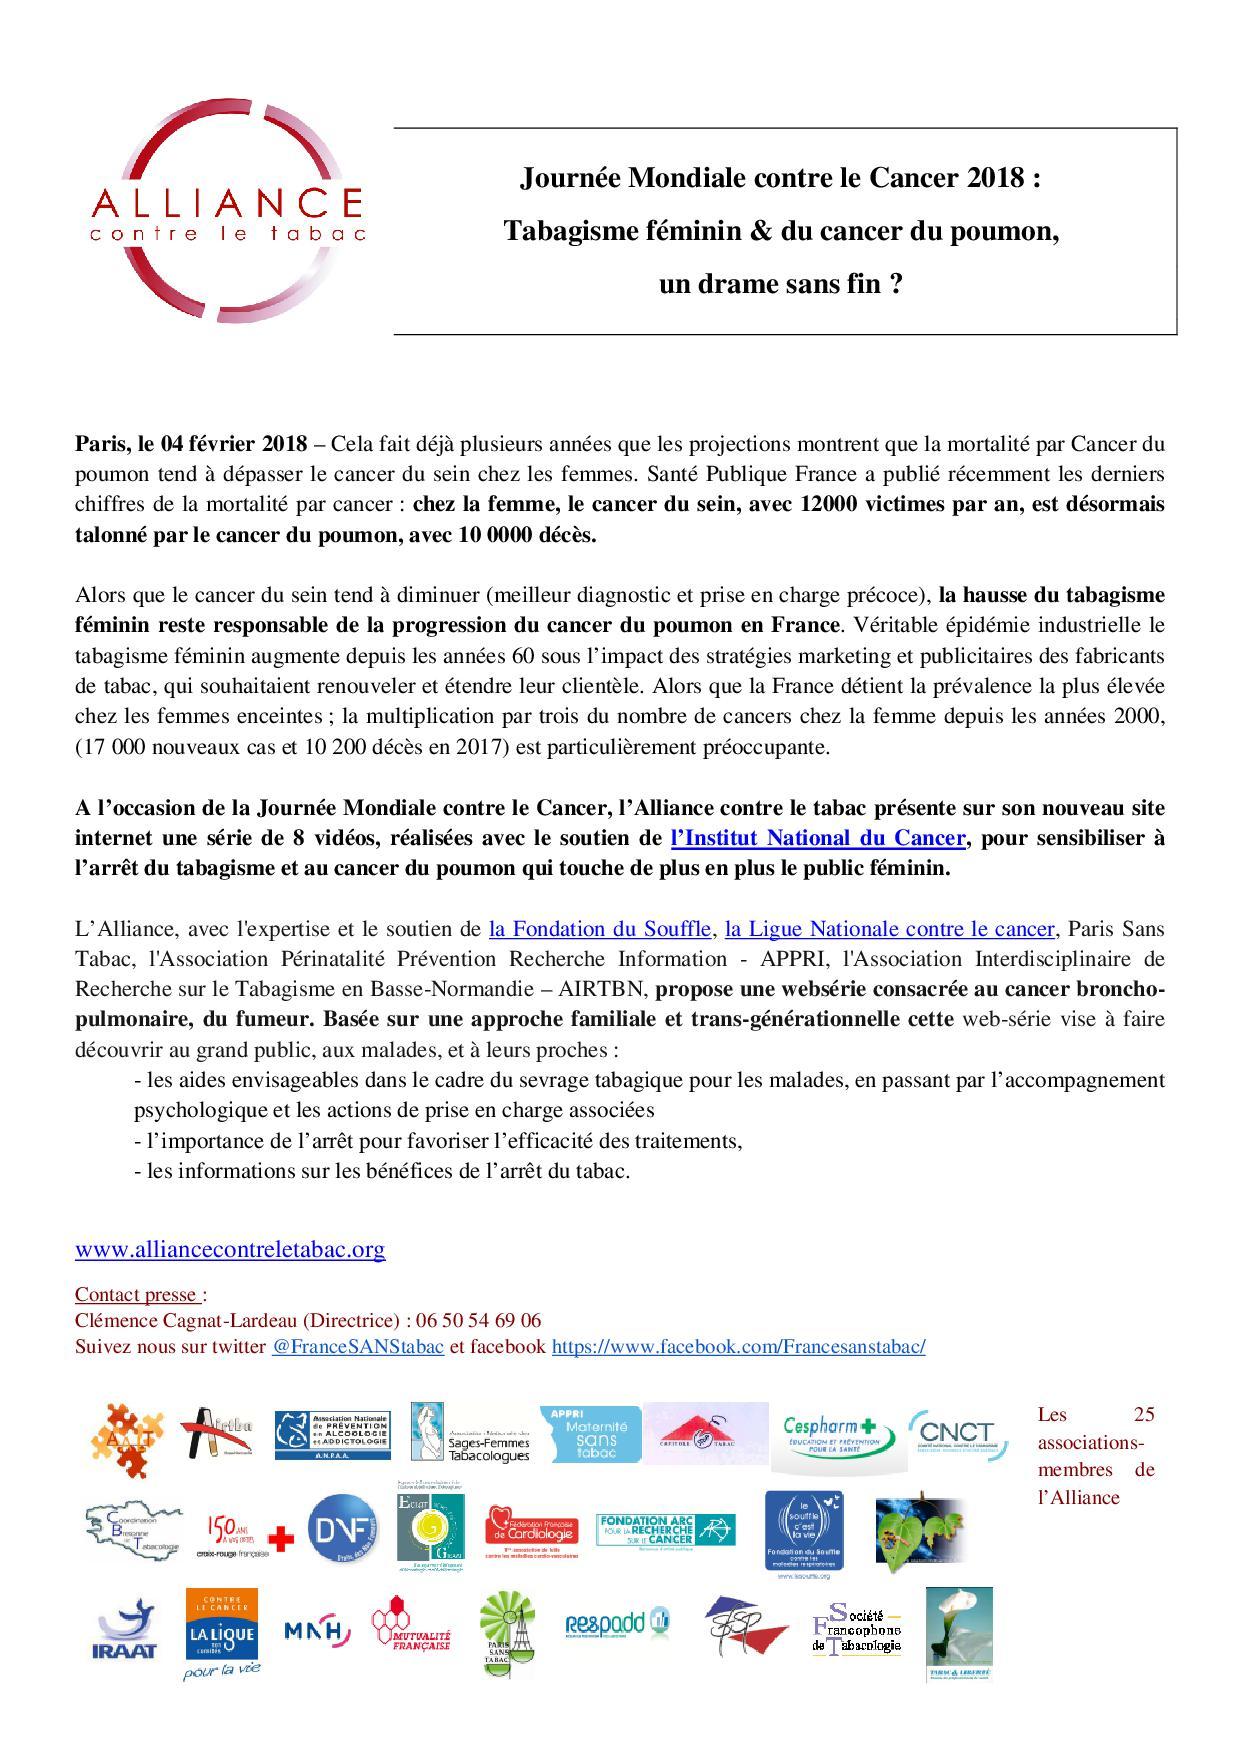 CP - Journée Mondiale du cancer - Webserie - 04022018.jpg